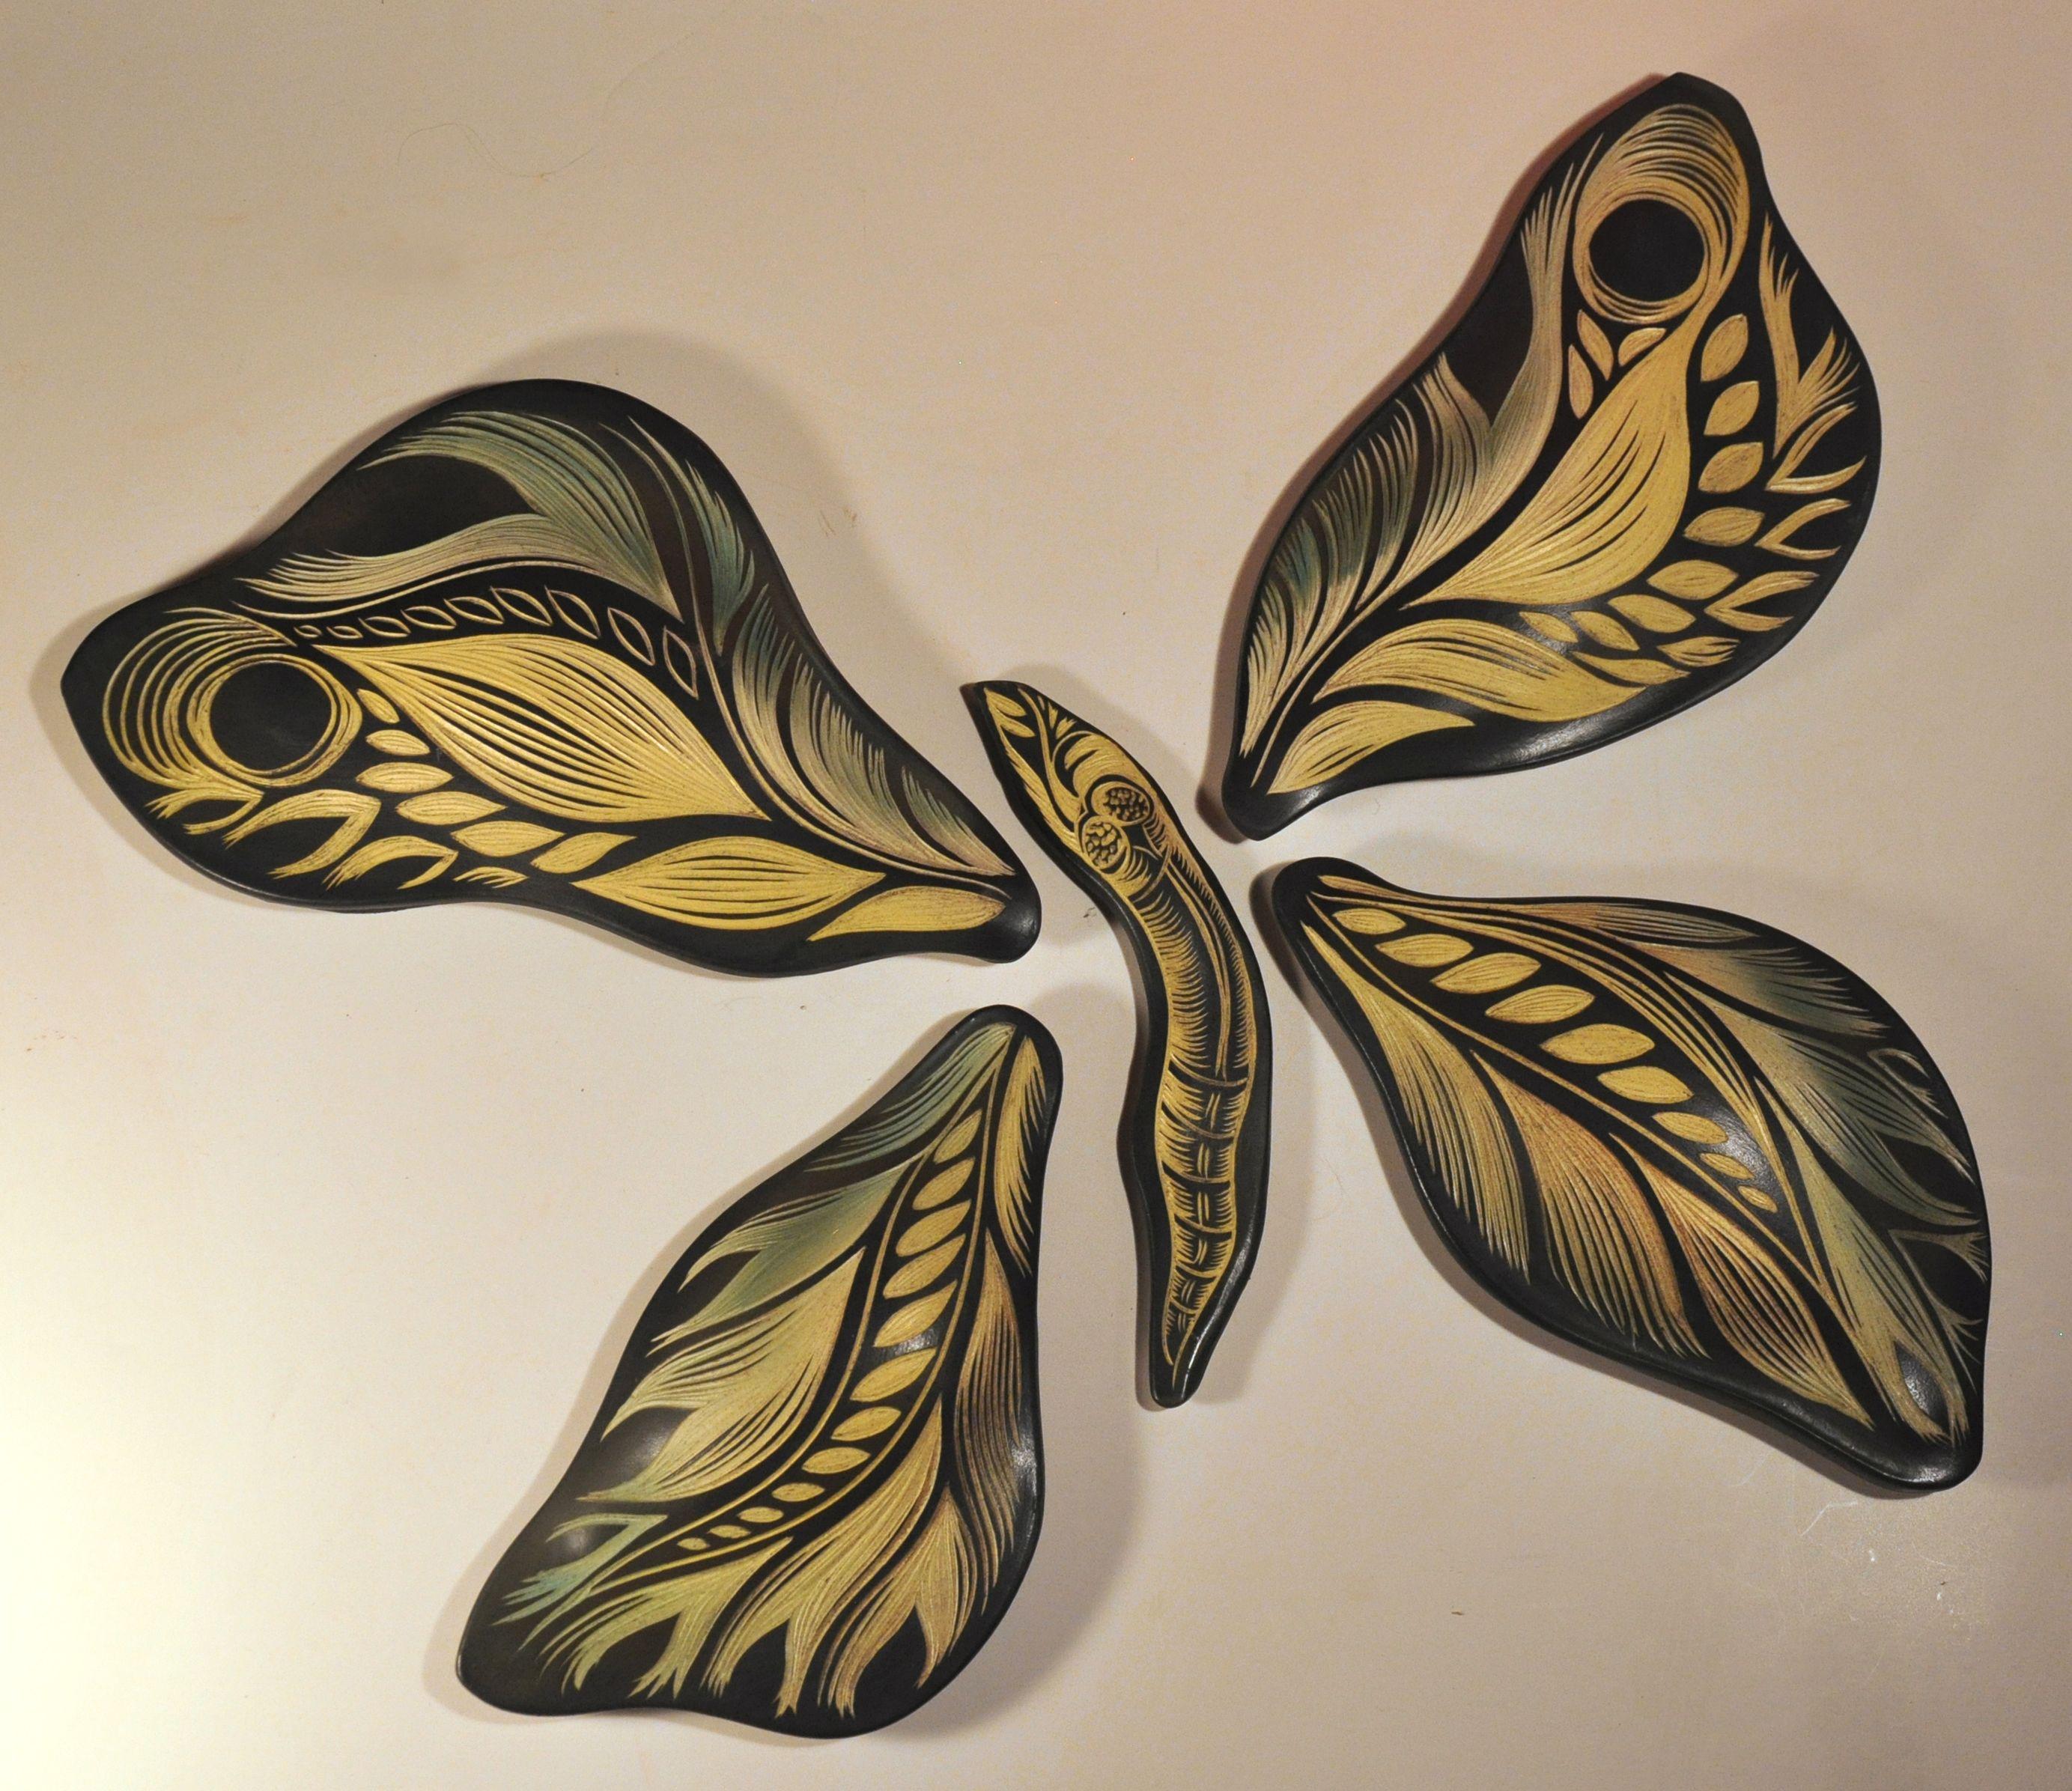 Natalie blake studios handmade ceramic wall art tile ceramic natalie blake studios handmade ceramic wall art tile dailygadgetfo Images